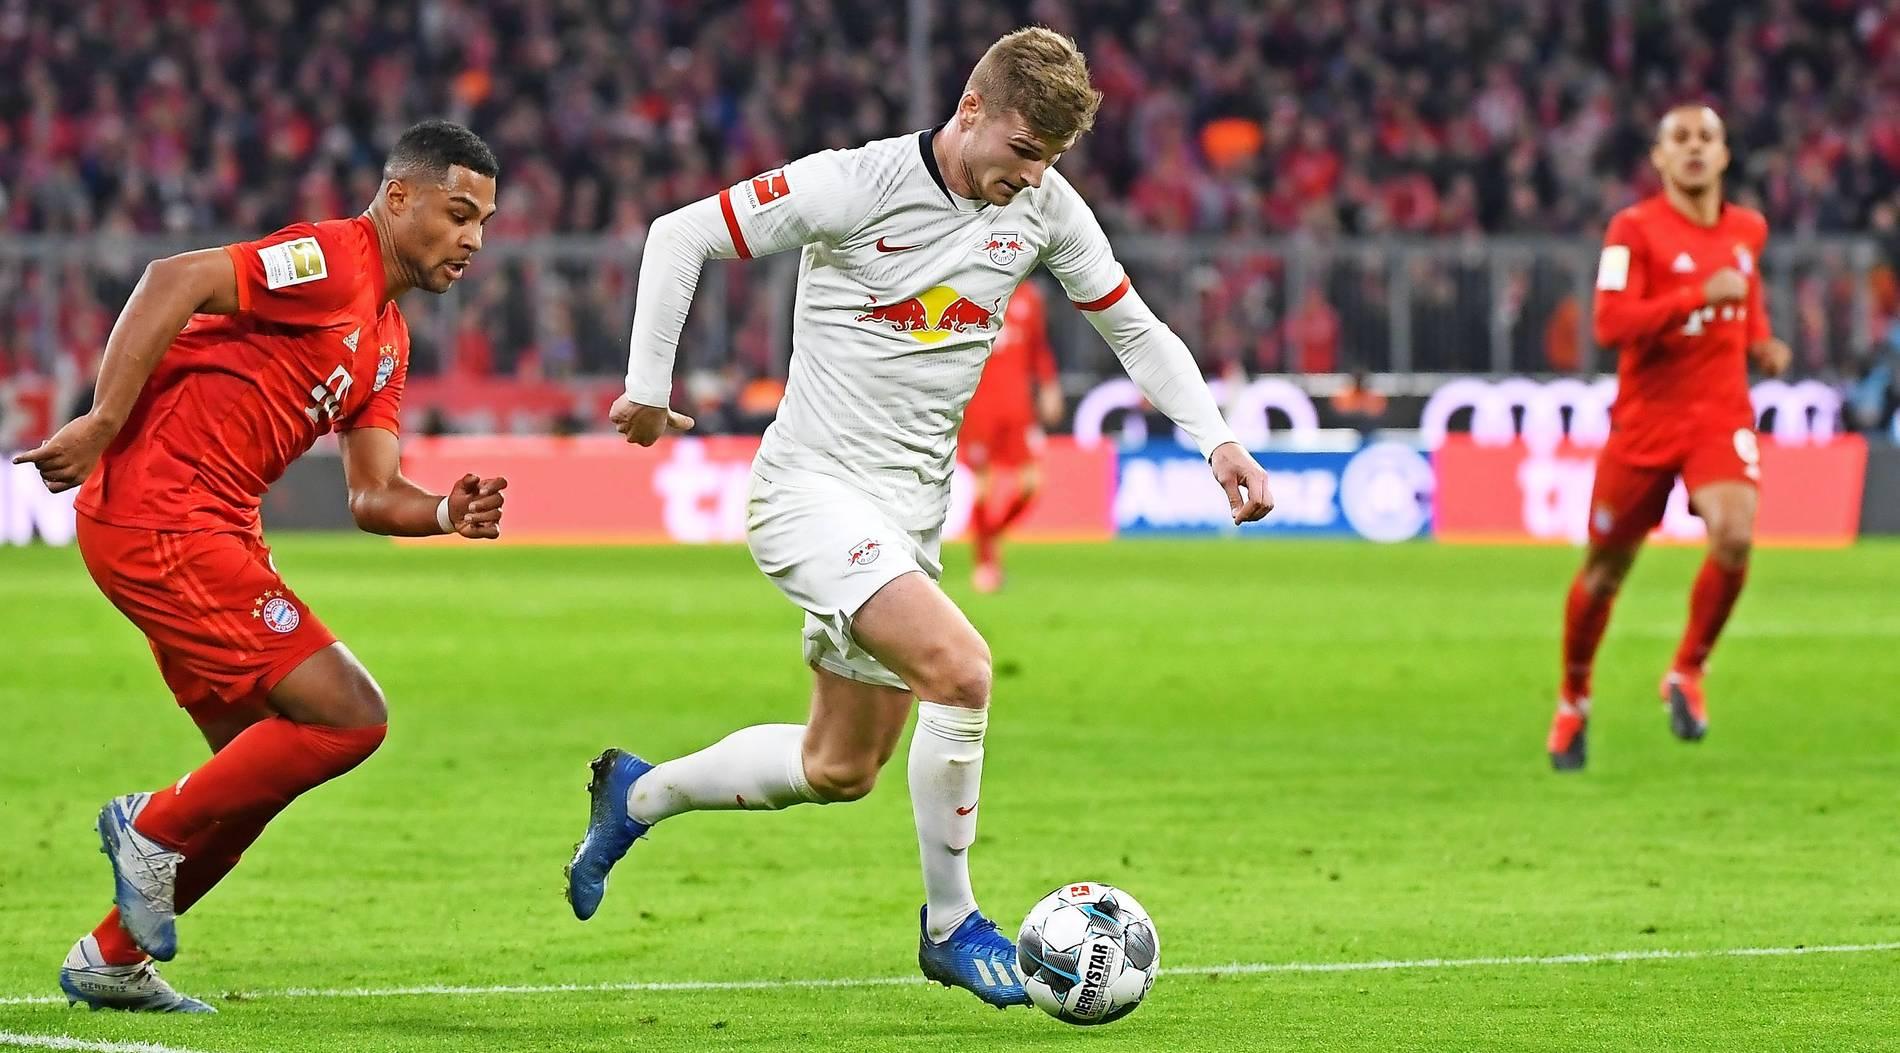 Rb Bayern Mitte